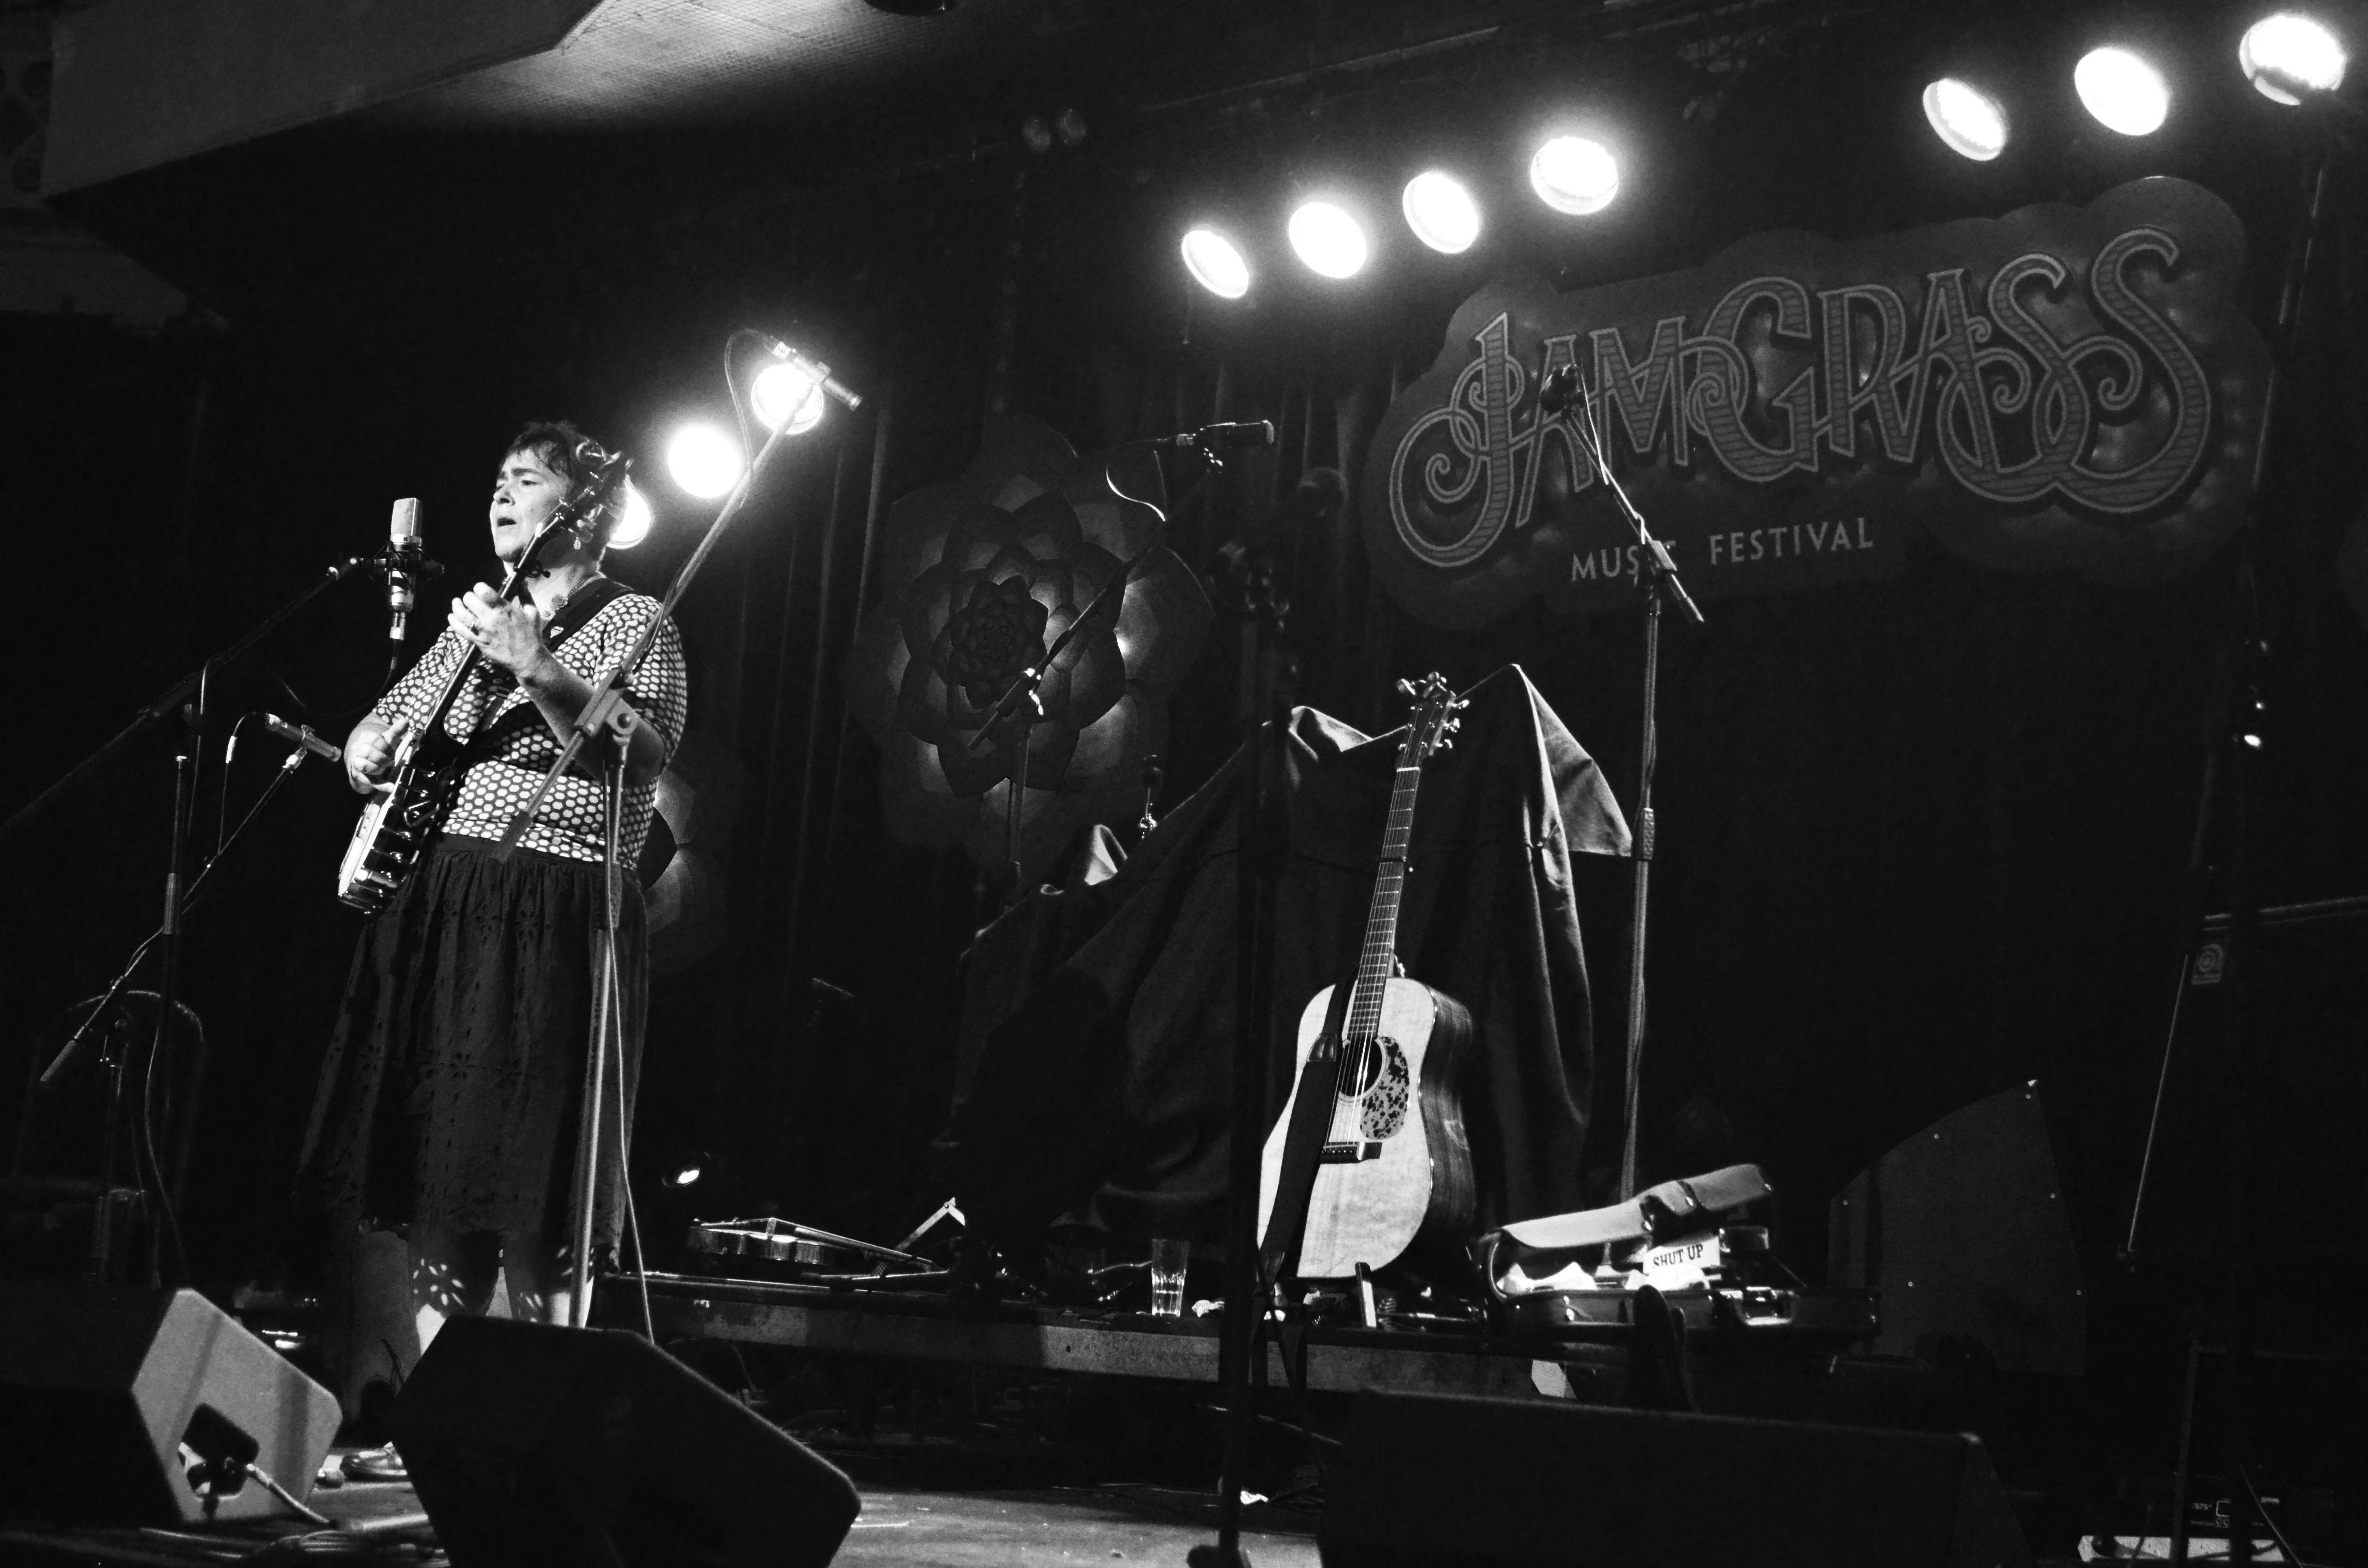 Annie Lou @ Jamgrass 2014